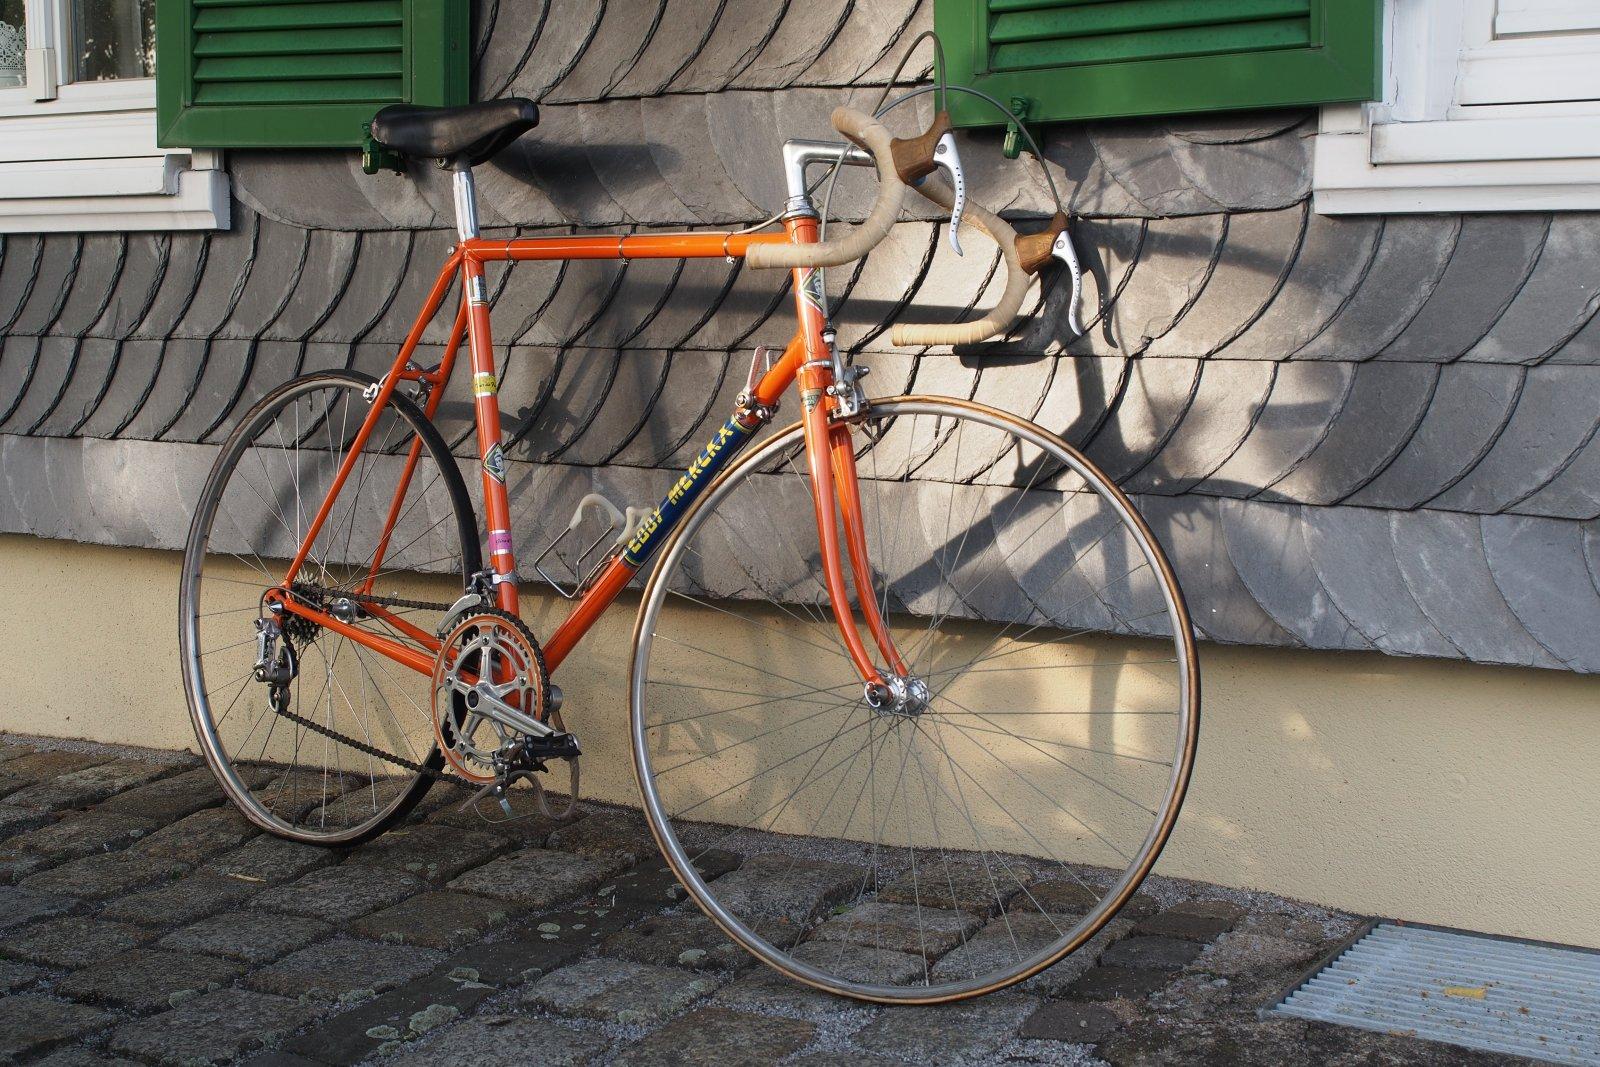 190604-EddyMerckx-30.JPG